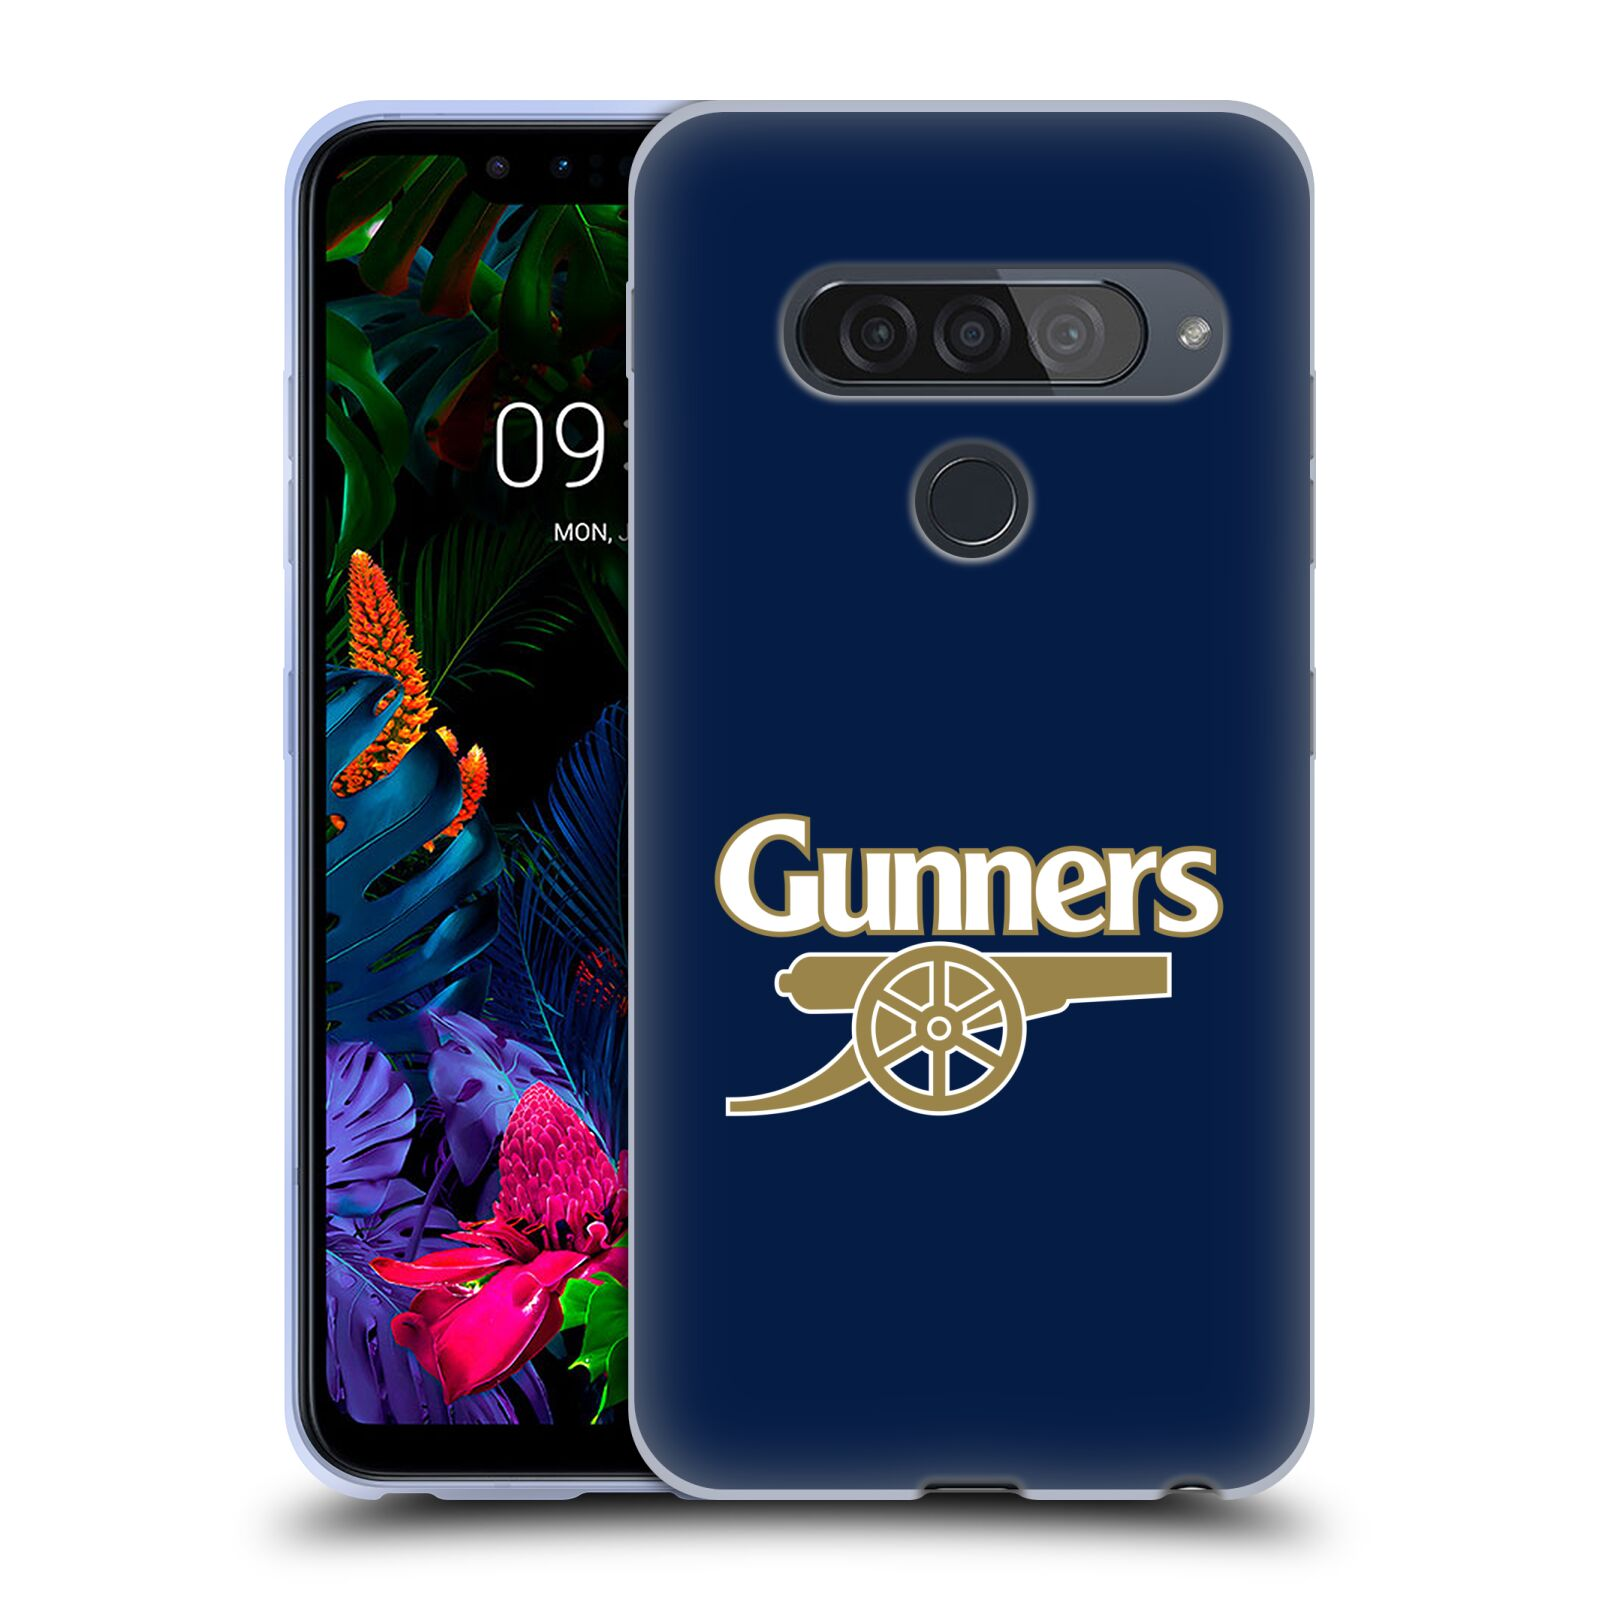 Silikonové pouzdro na mobil LG G8s ThinQ - Head Case - Arsenal FC - Gunners